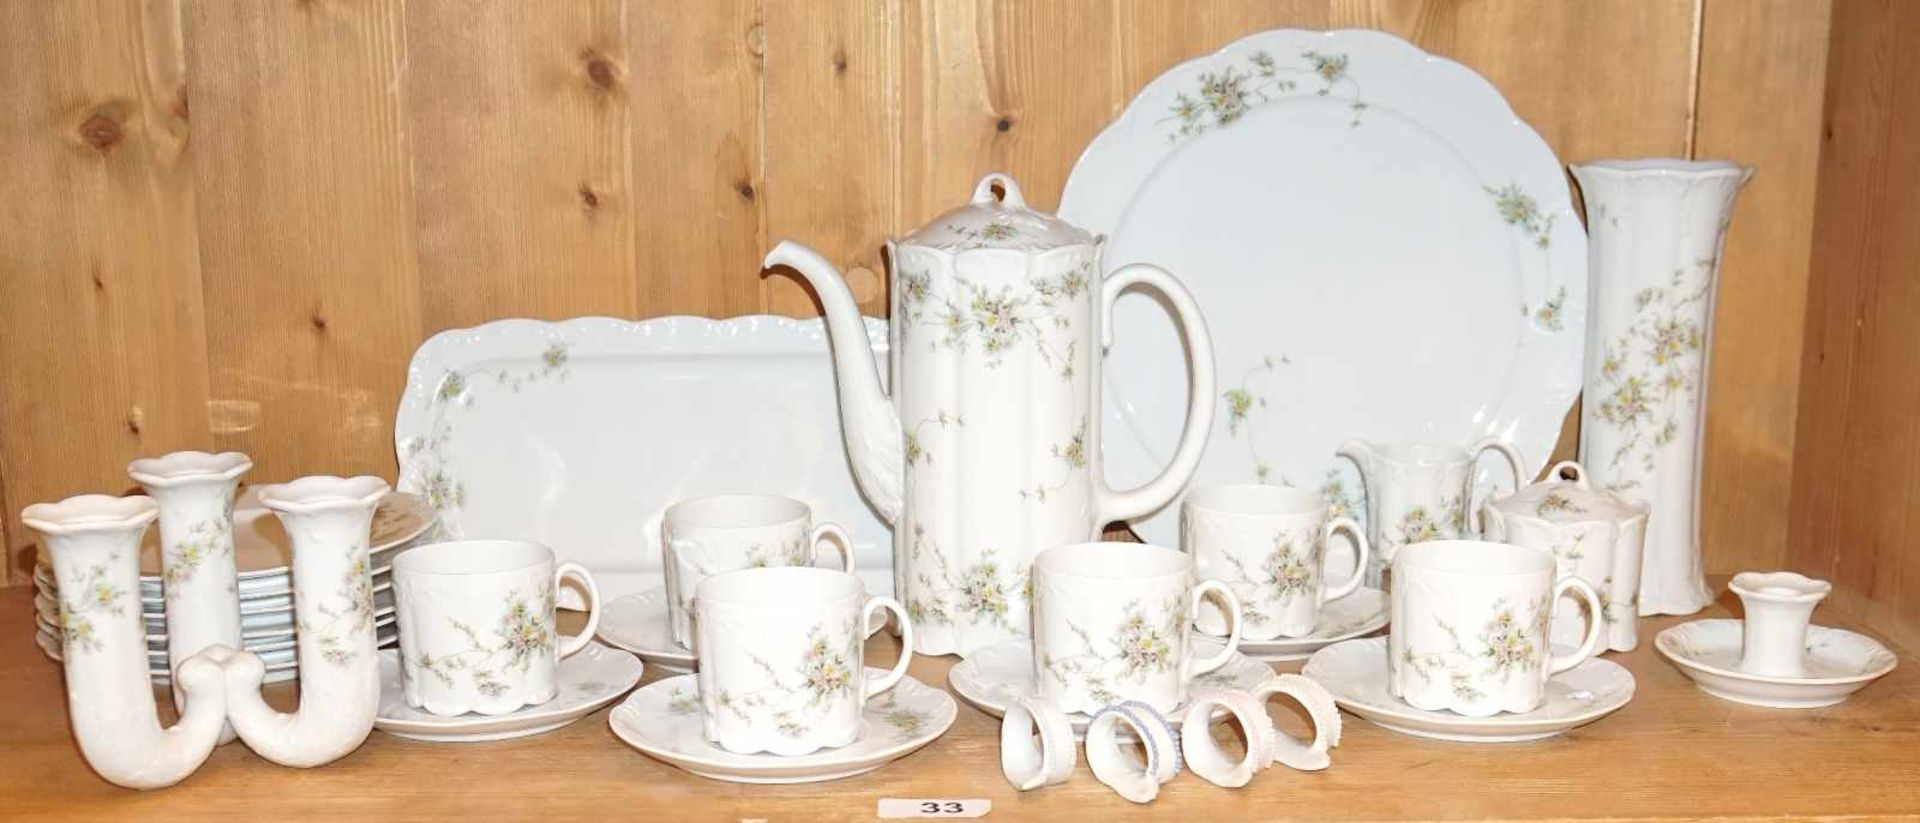 1 KaffeeservicePorz. ROSENTHAL GROUP Blumendekor m. Vase und Kerzenhalter f. 6 Pers. Asp.